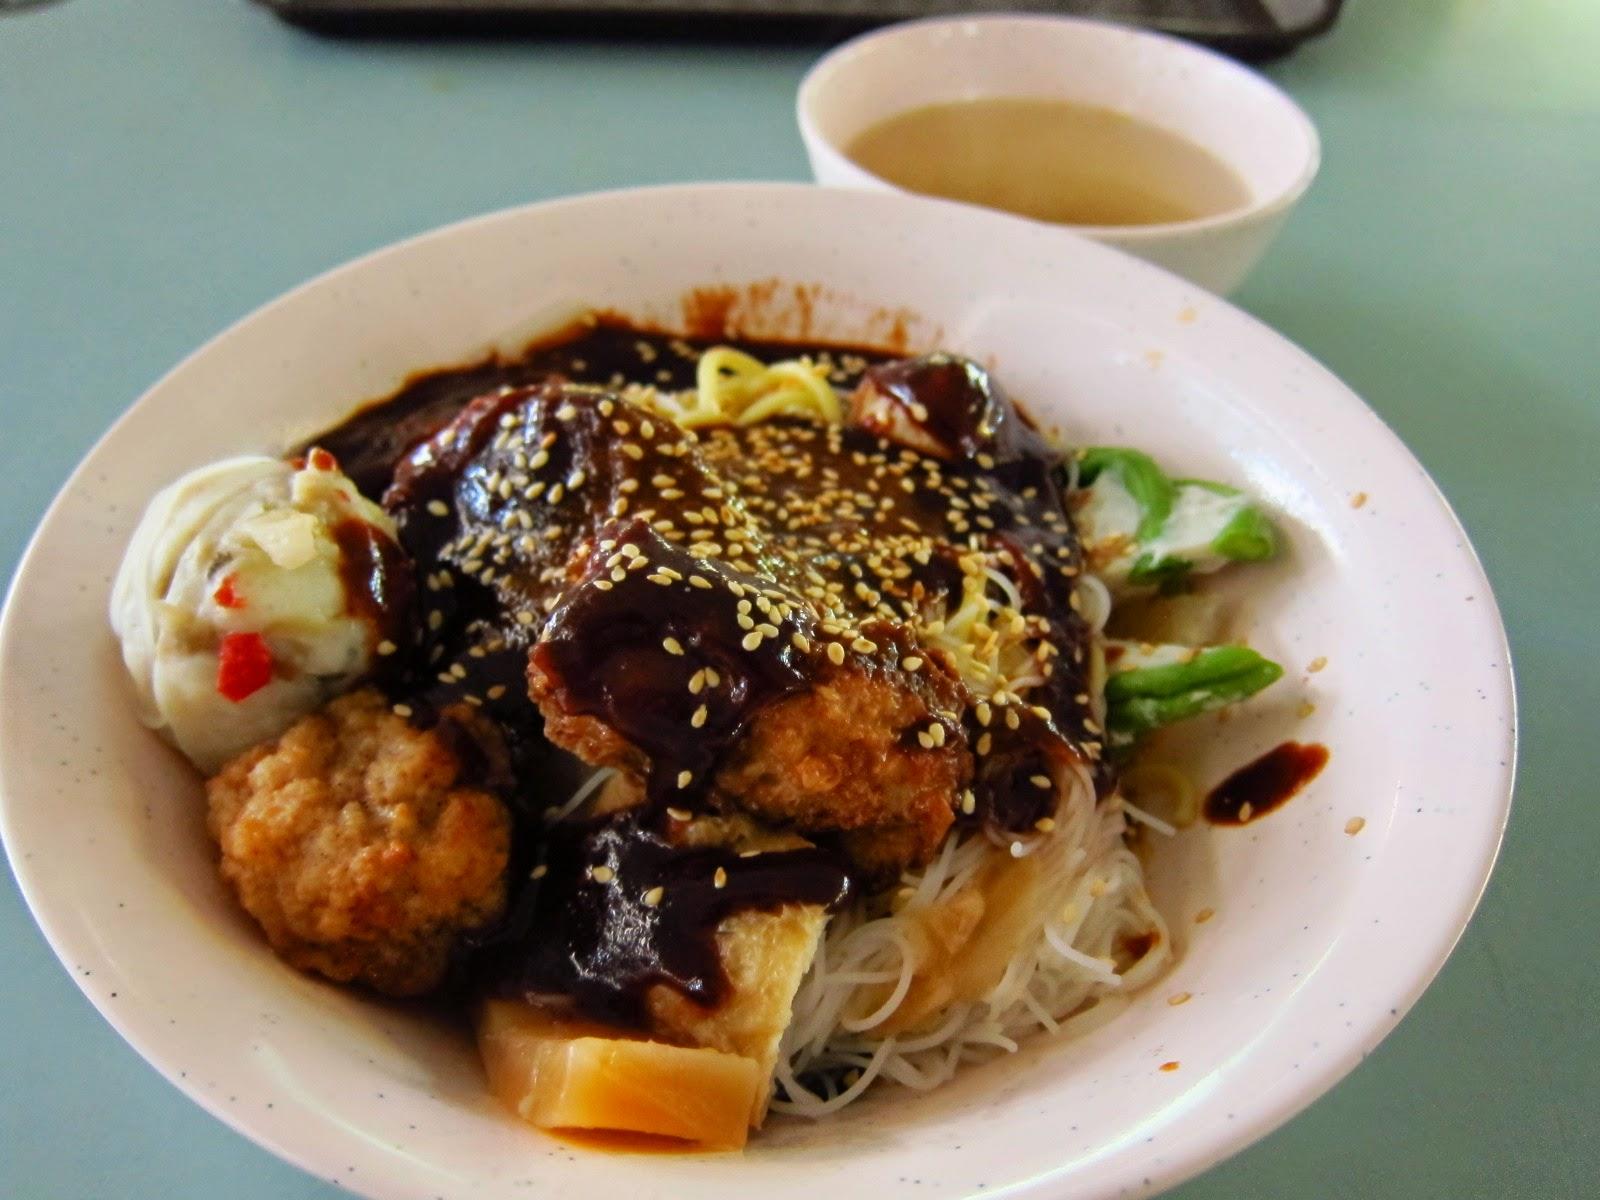 yong tau fu meatballs dry vermicelli sweet brown sauce sesame seeds singapore malaysia traditional hakwer street food